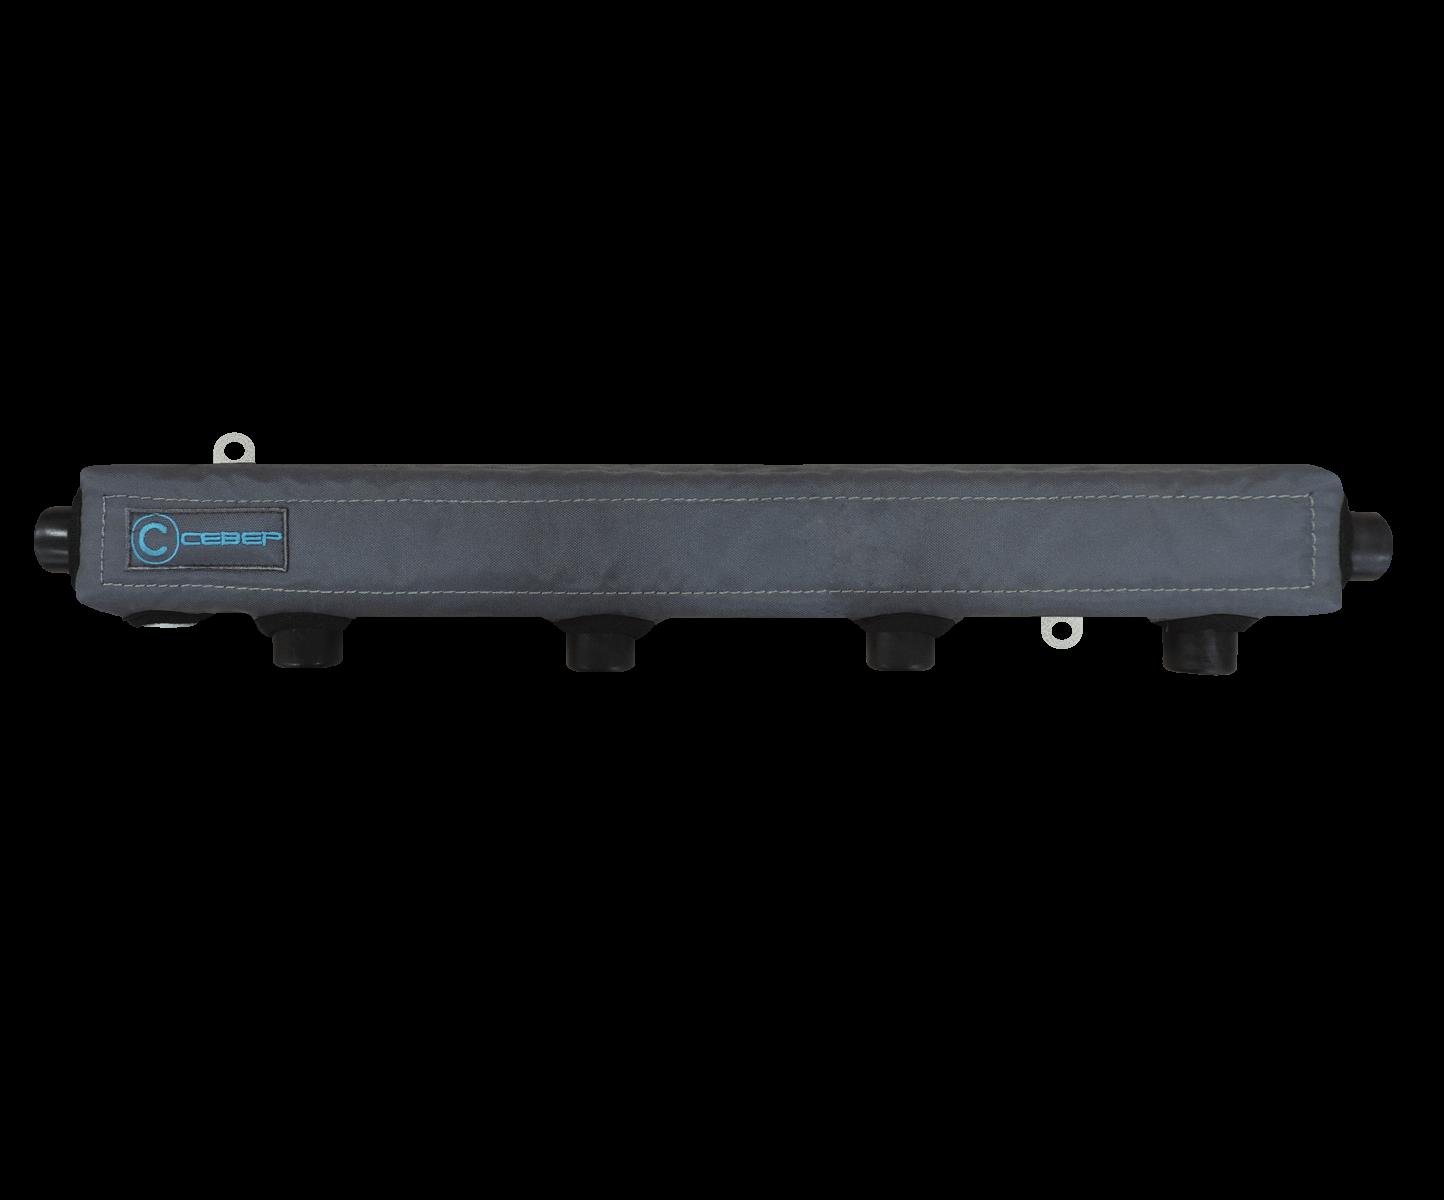 Теплоизоляция, теплоизоляционный чехол для гидрообвязки Север К4